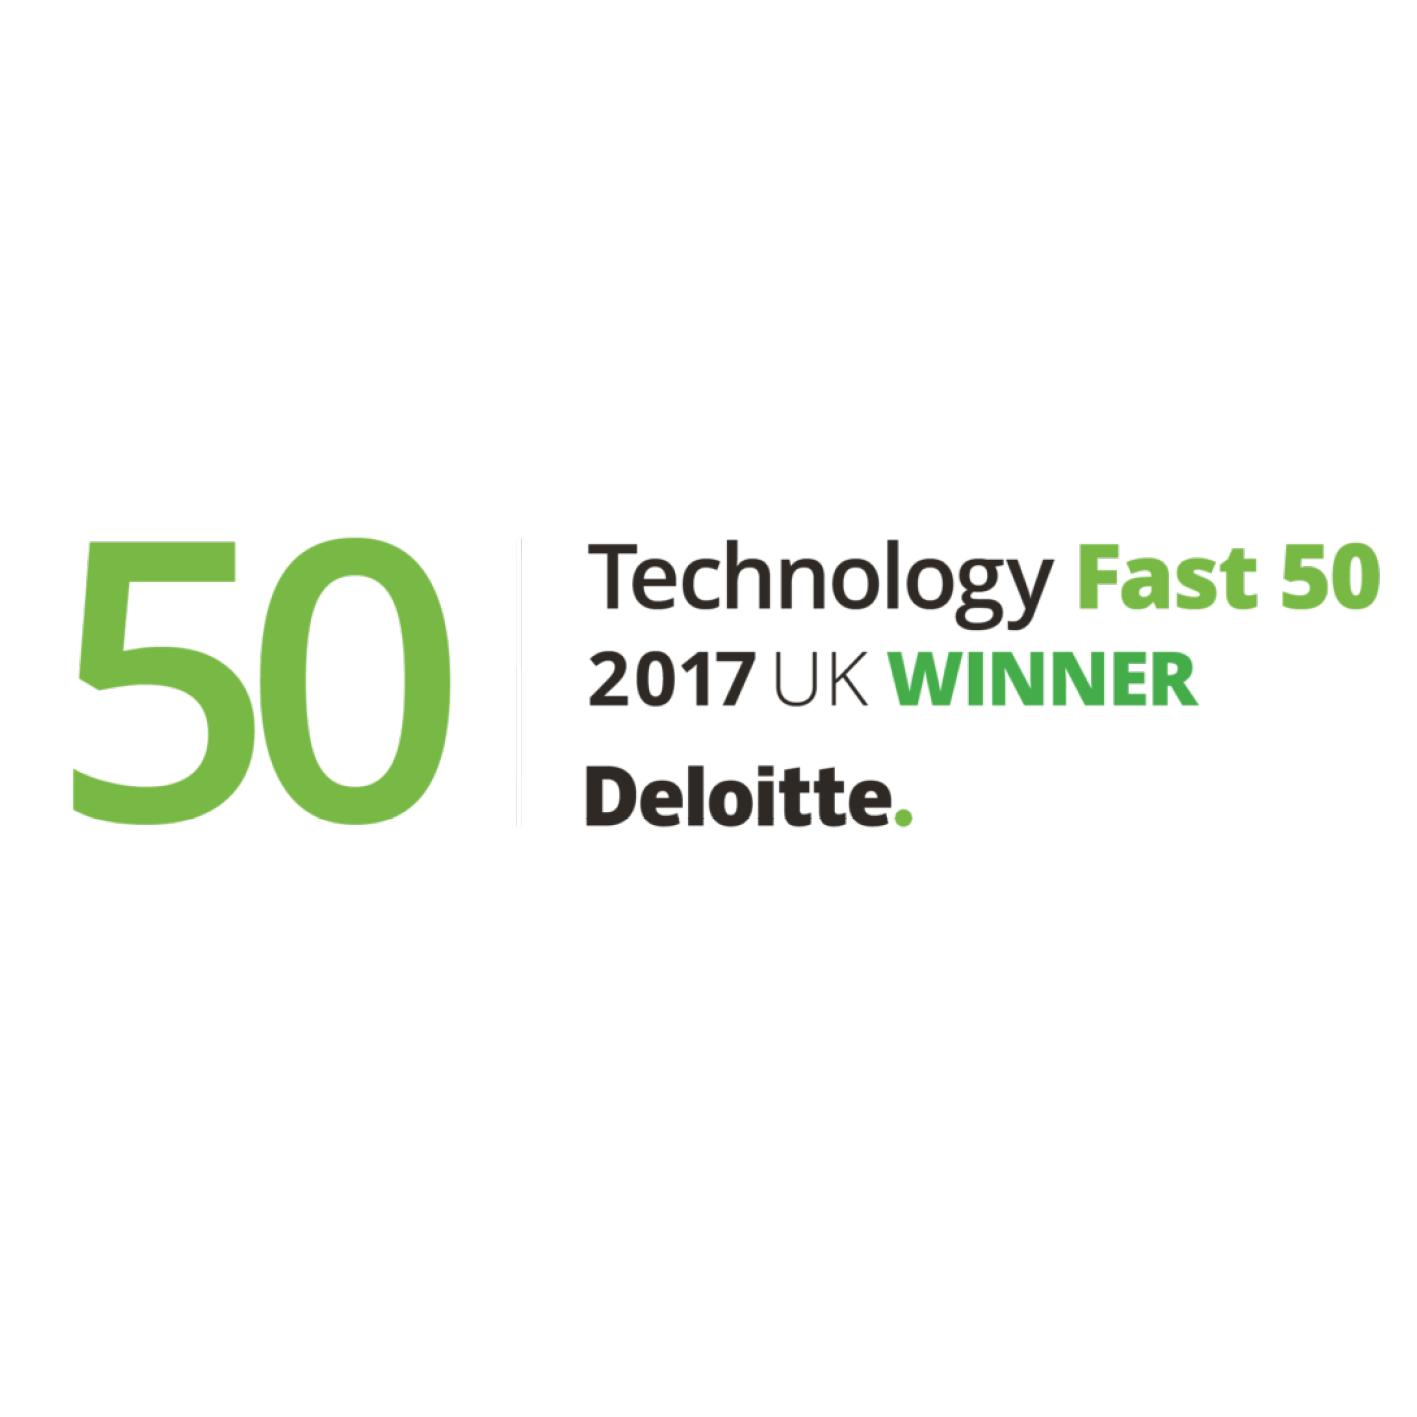 Technology Fast 50